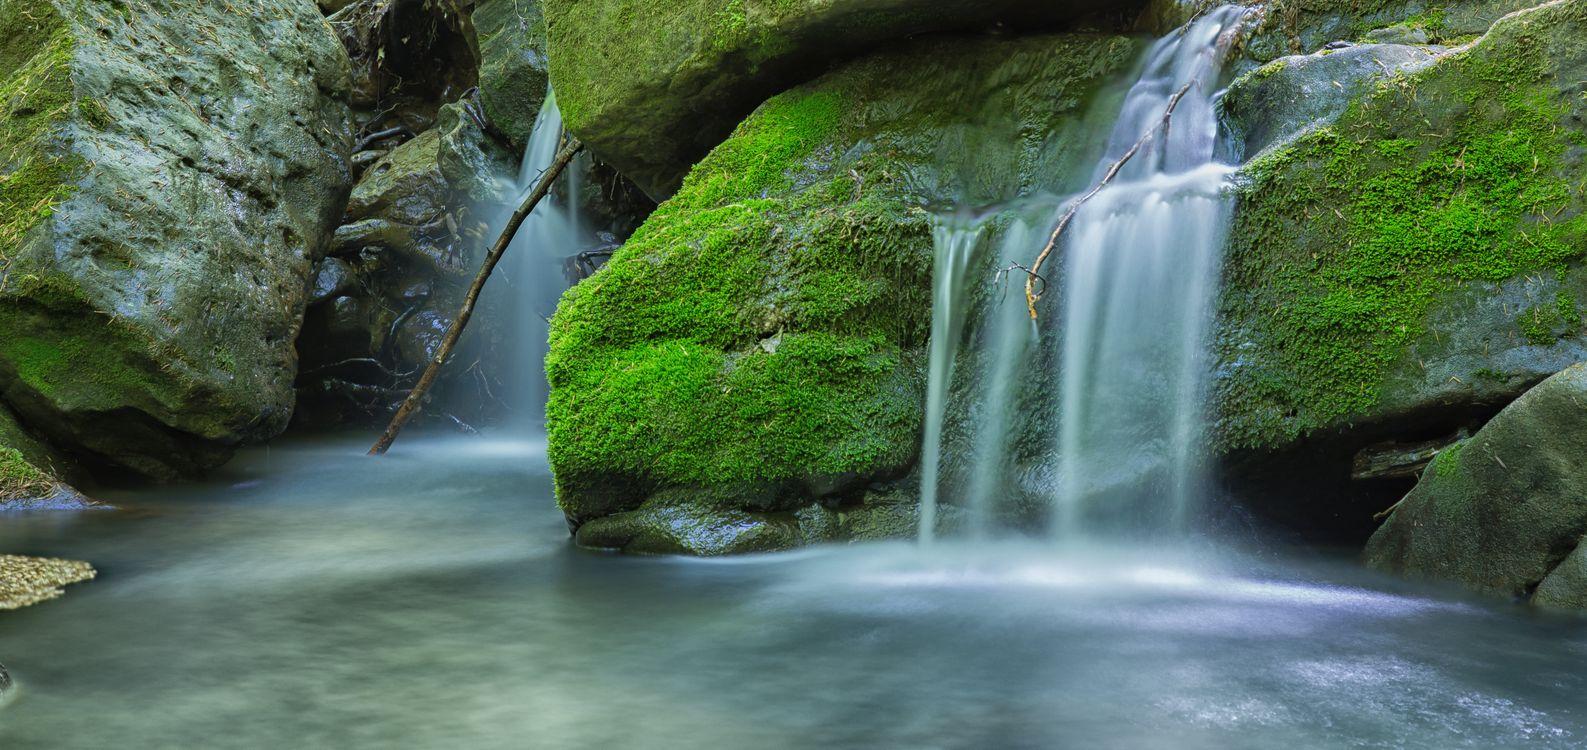 Обои мшистый лес мох, скалы, водопад картинки на телефон